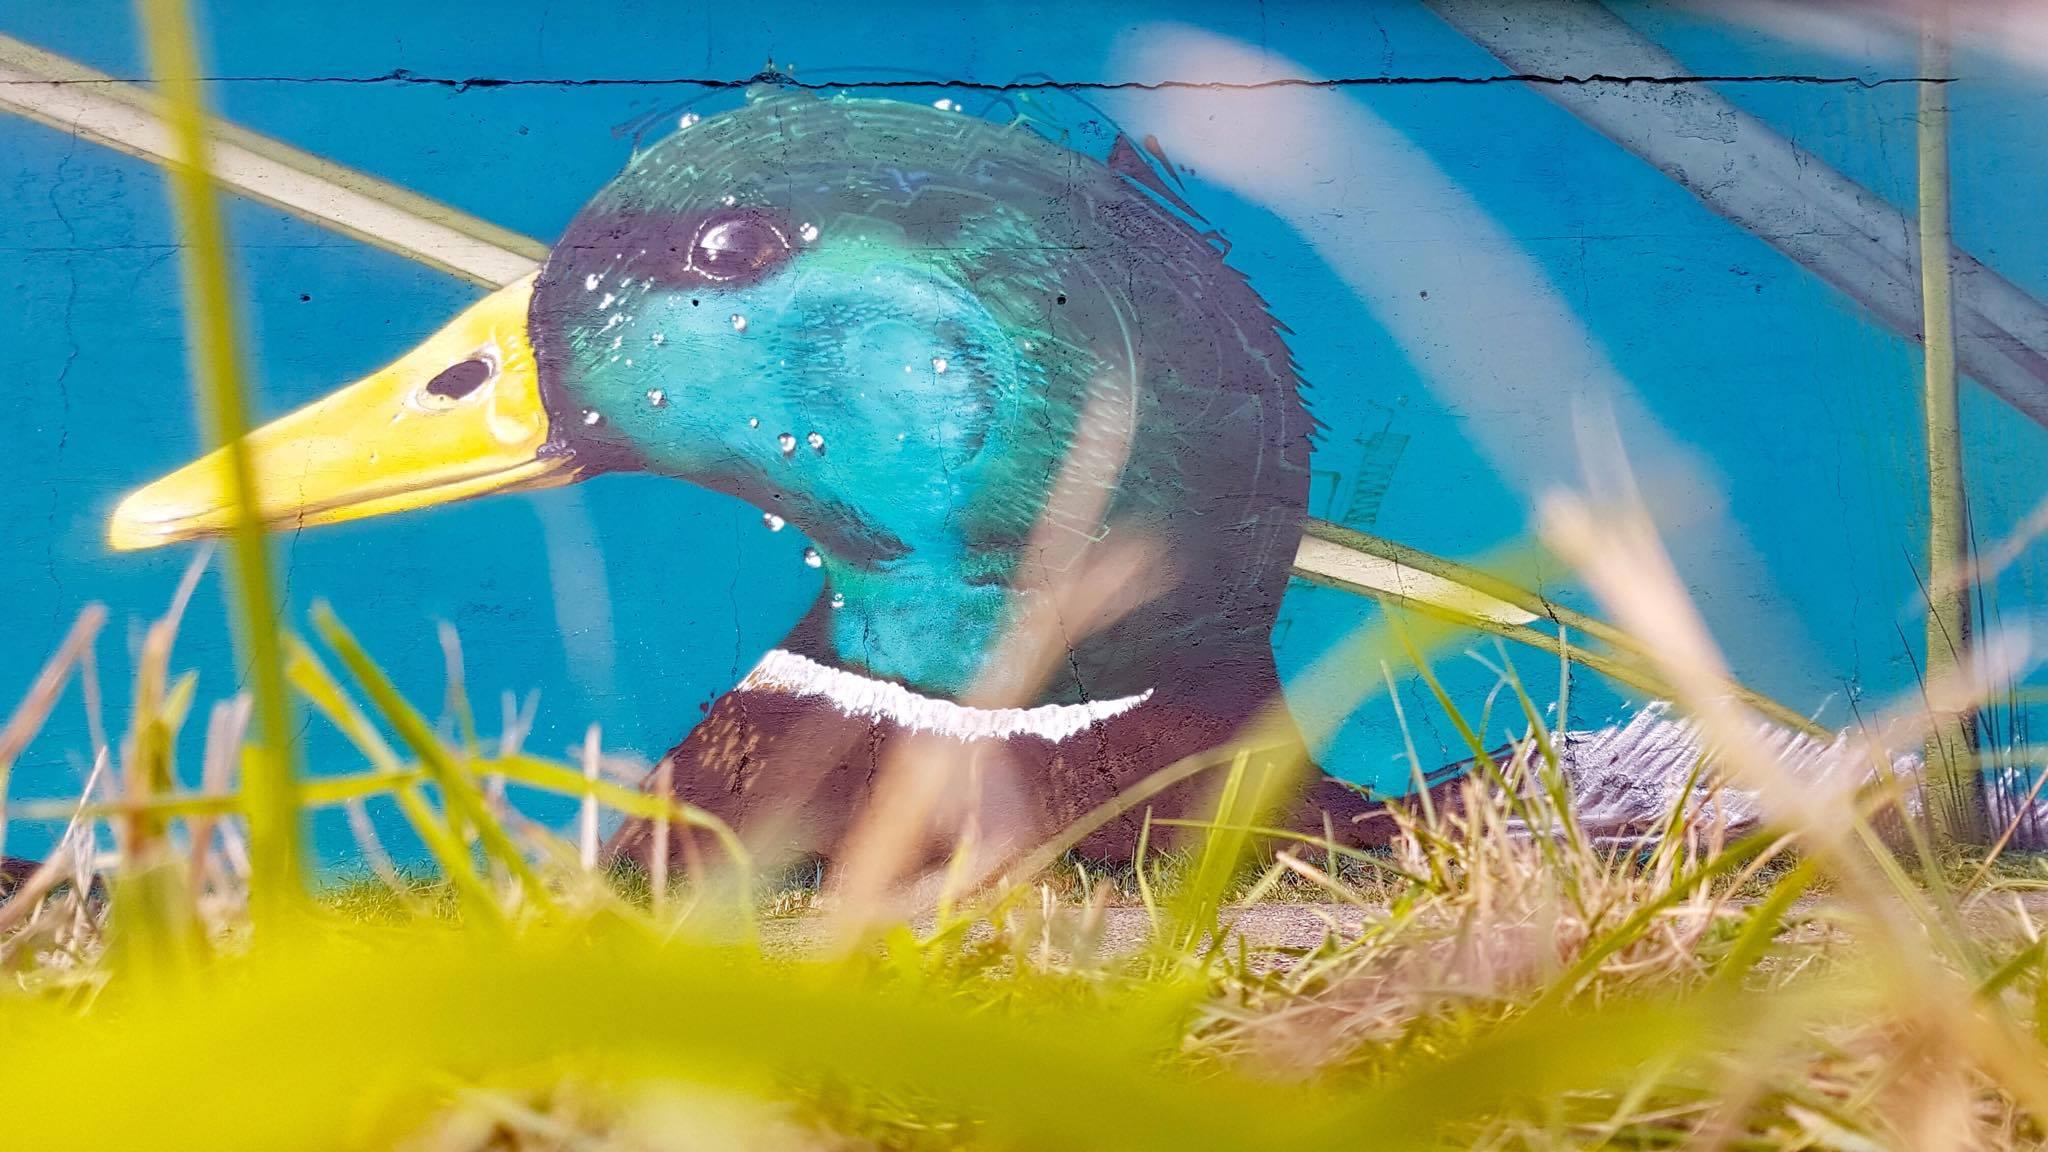 https://www.propaganza.be/wp-content/uploads/2019/04/Sorka-typo-calligraphy-propaganza-urban-artist-graffiti-graff-street-art-spray-painting-belgique-1.jpg